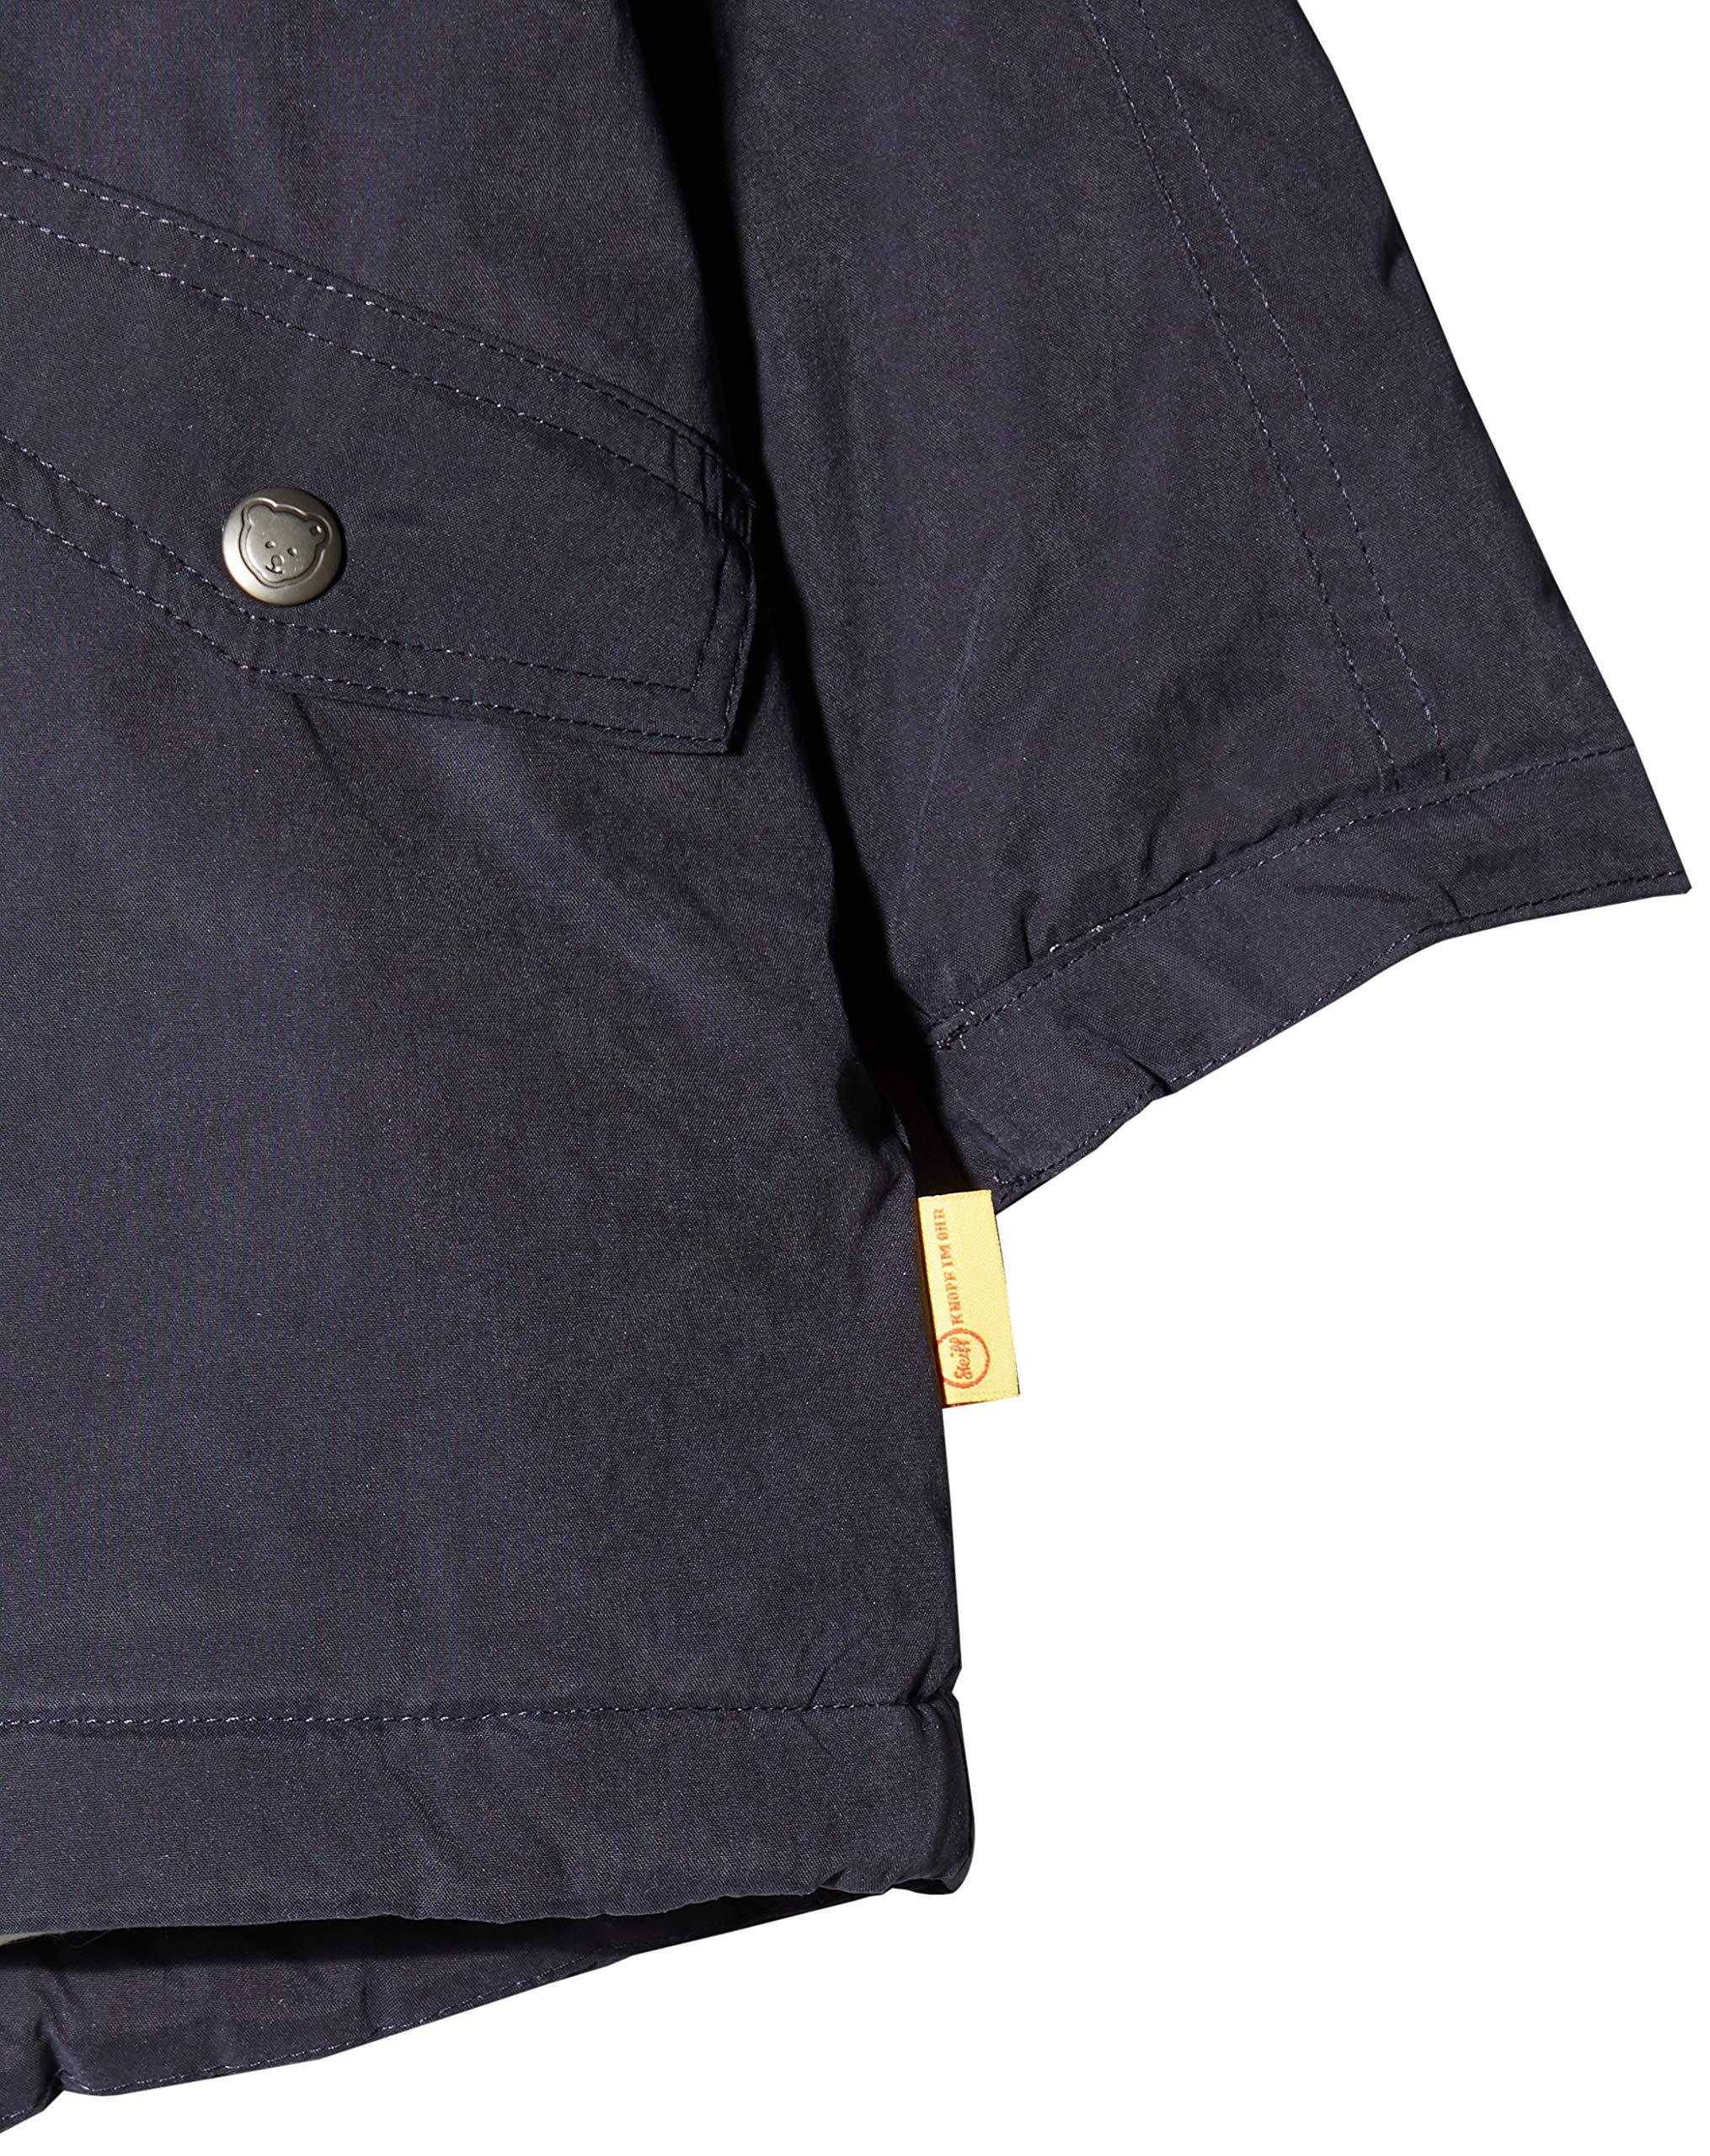 Steiff Jacket Chaqueta para Bebés 4